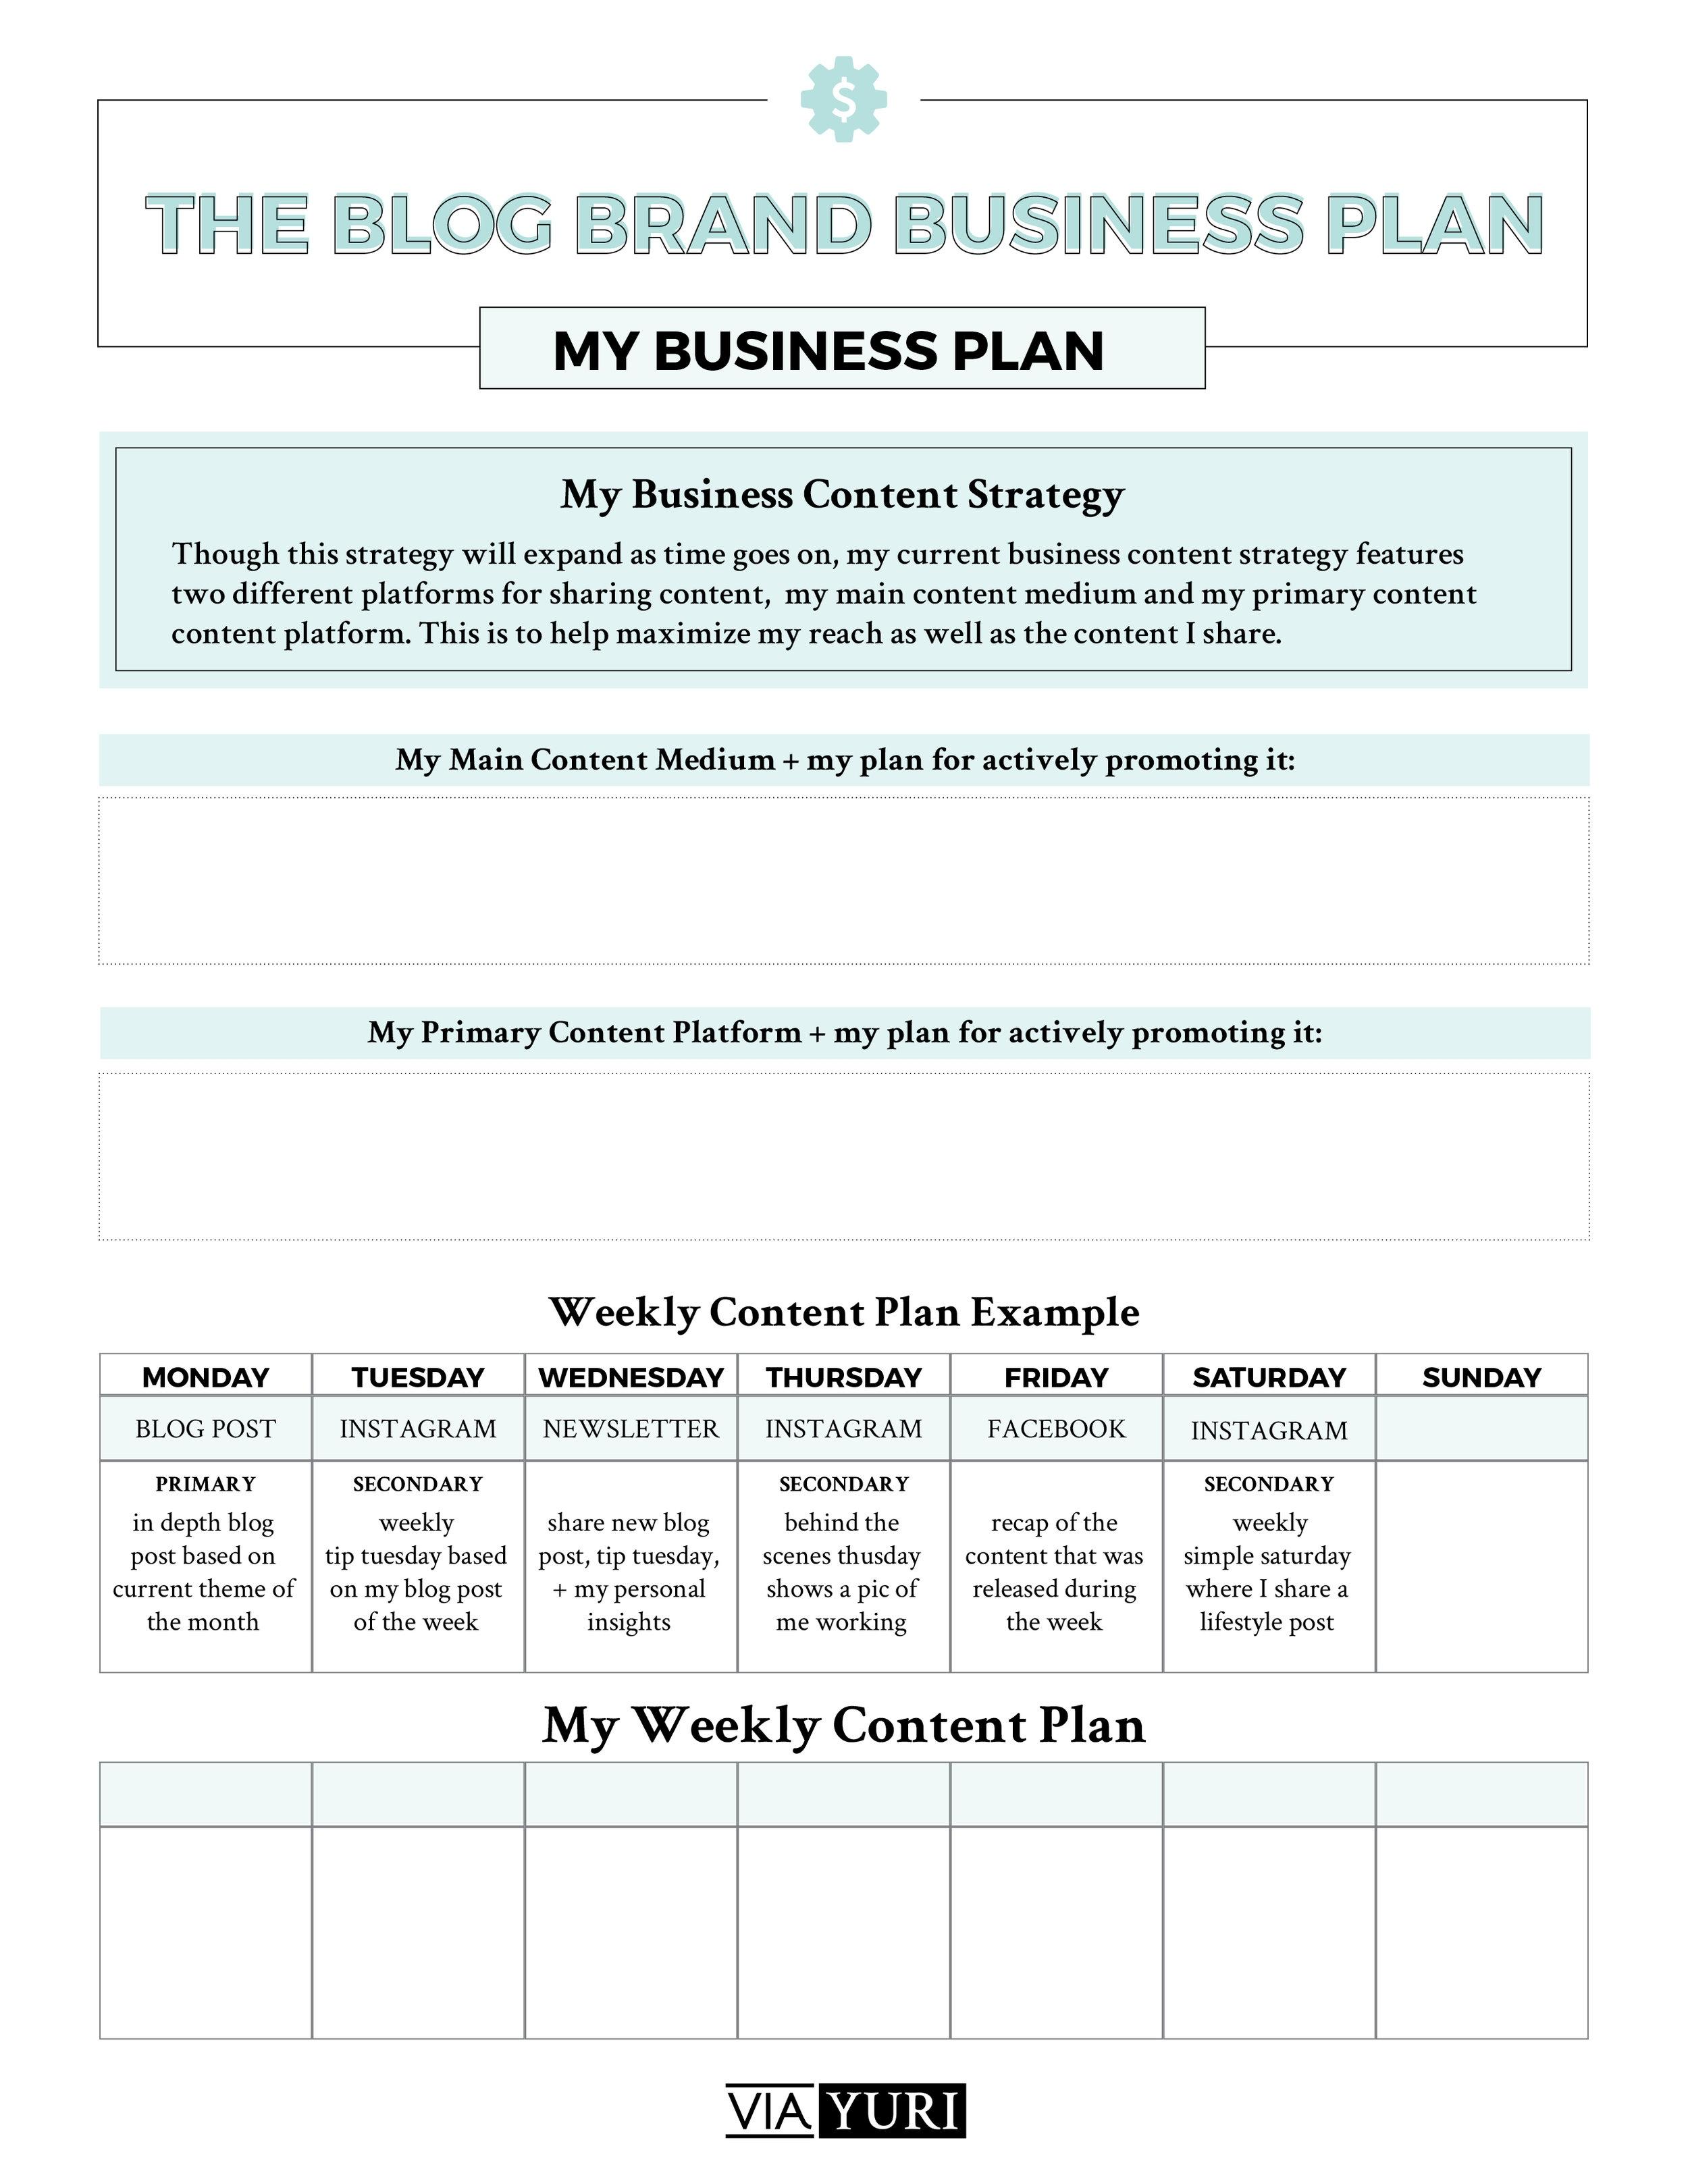 Weekly Content Plan Worksheet || The Side Hustle Quickstart Roadmap Free Course Worksheets | viaYuri.com